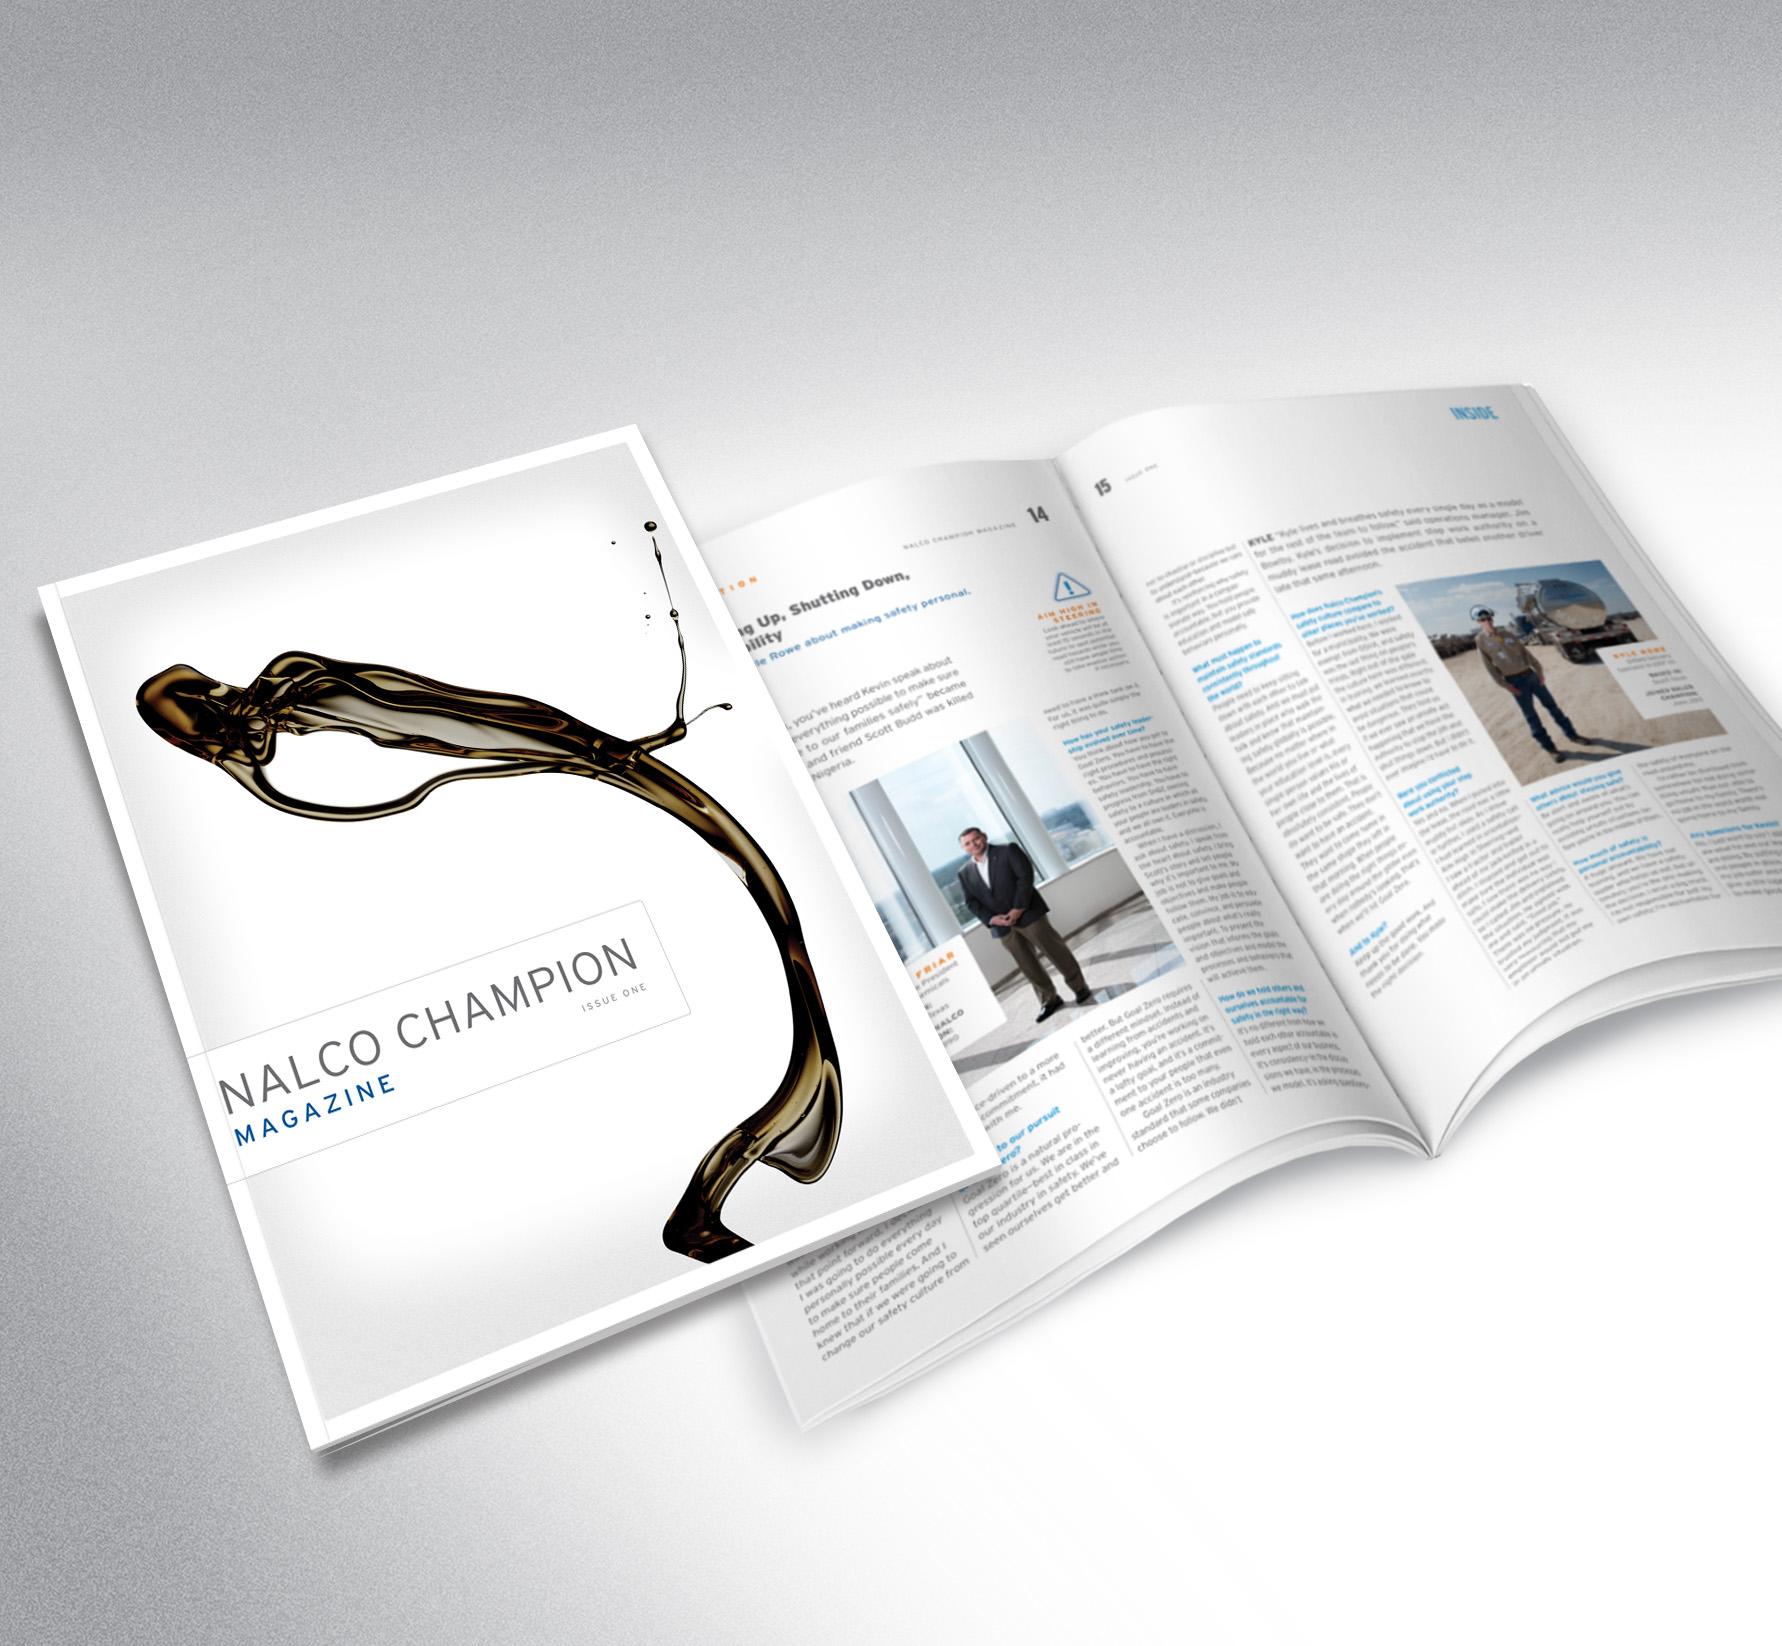 NalcoChampionMagazine_AimeeBorders